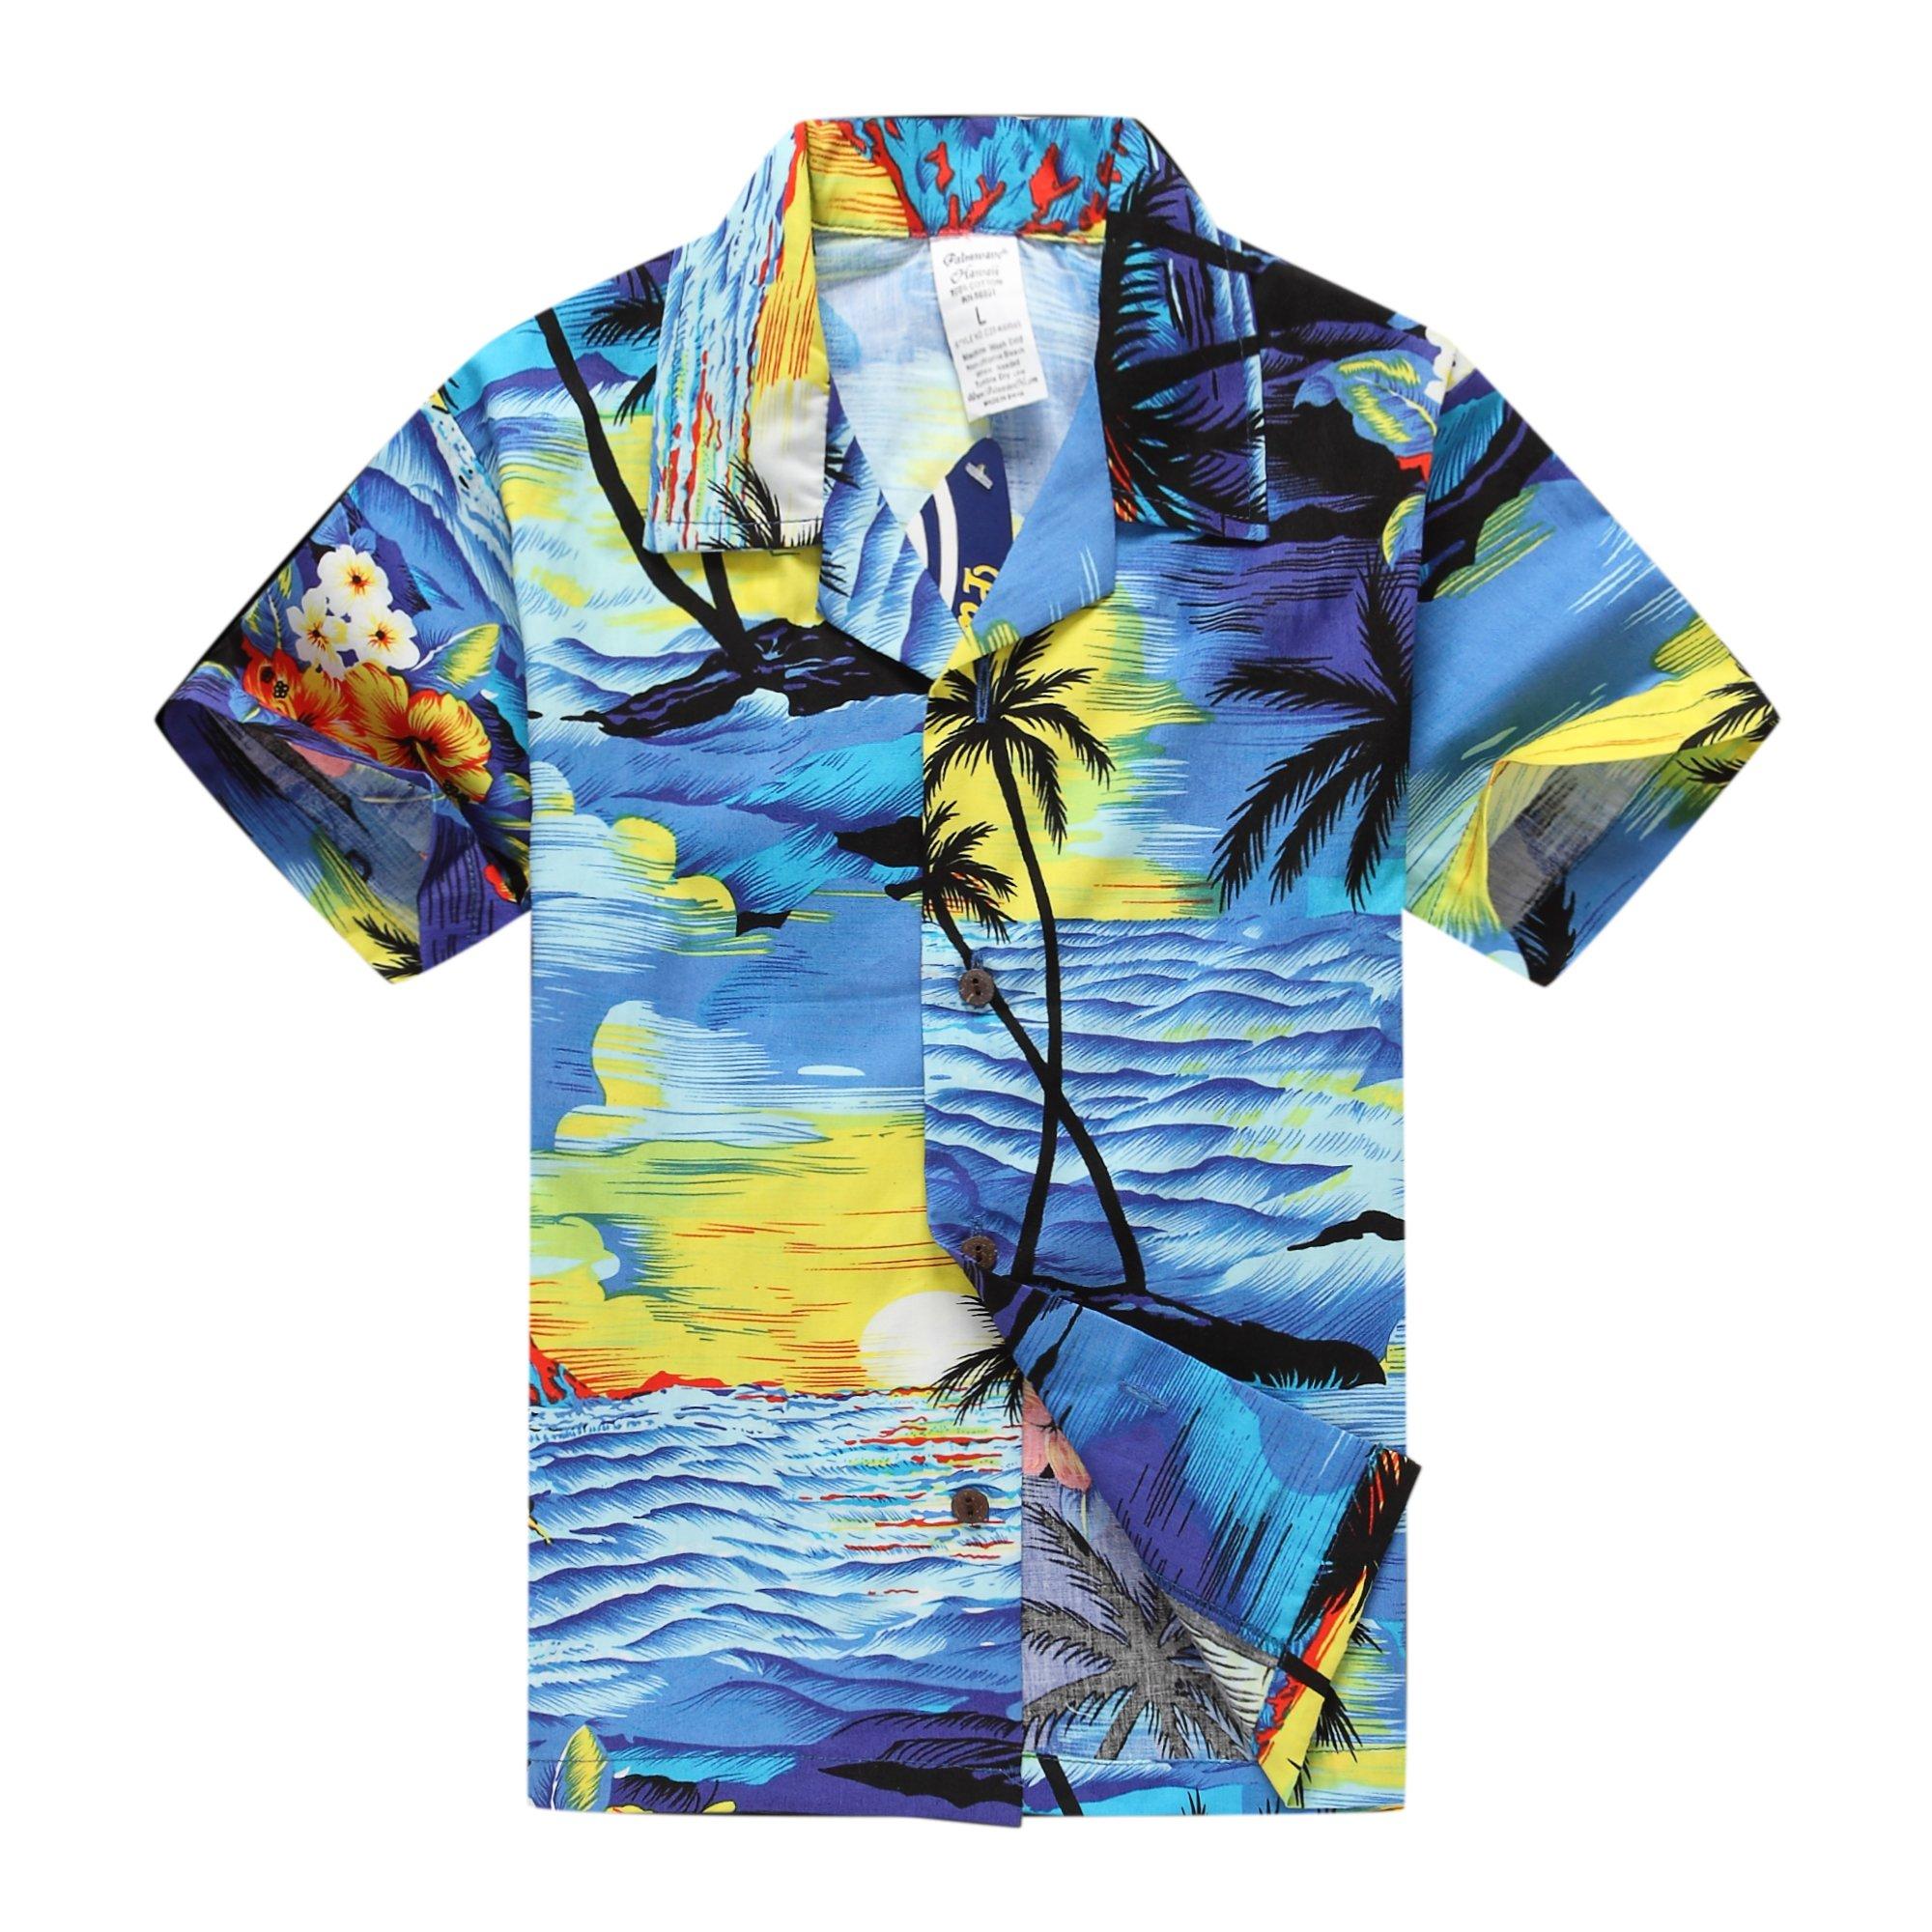 066d36a3 Get Quotations · Palm Wave Boy Hawaiian Aloha Luau Shirt and Shorts 2 Piece  Cabana Set In Blue Sunset